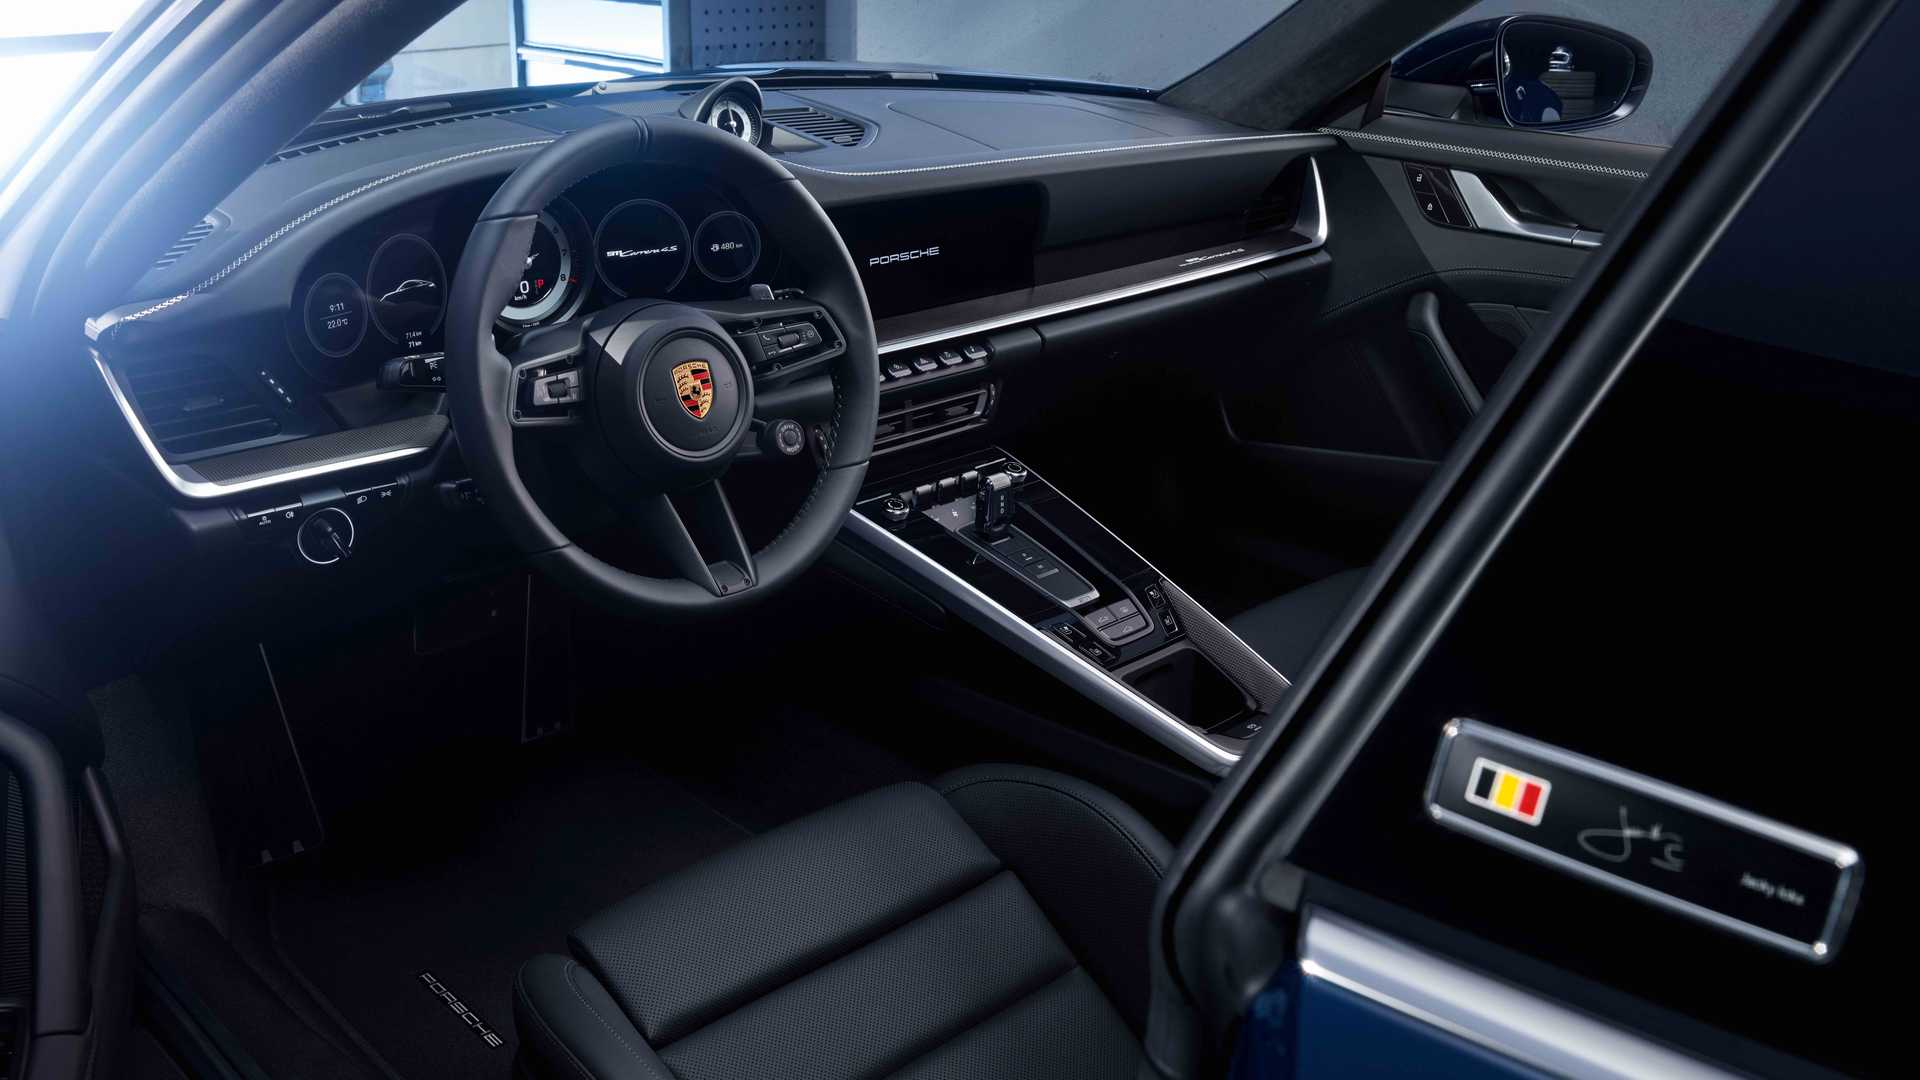 Ra mắt Porsche 911 phiên bản đặc biệt Belgian Legend - 6